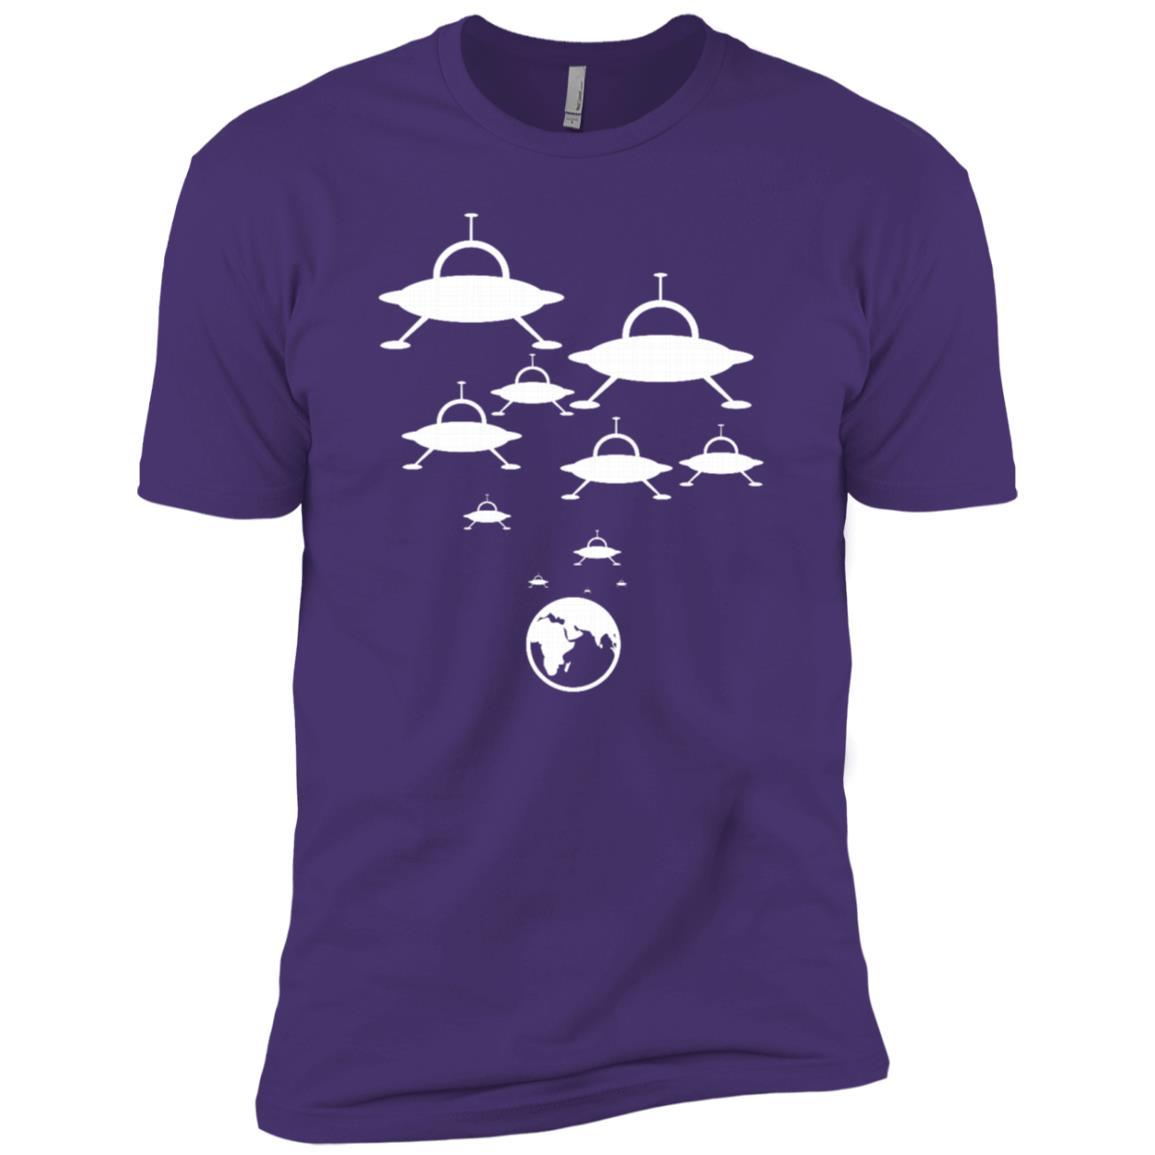 Alien Spaceships Landing On The Earth Ufo Funny Men Short Sleeve T-Shirt